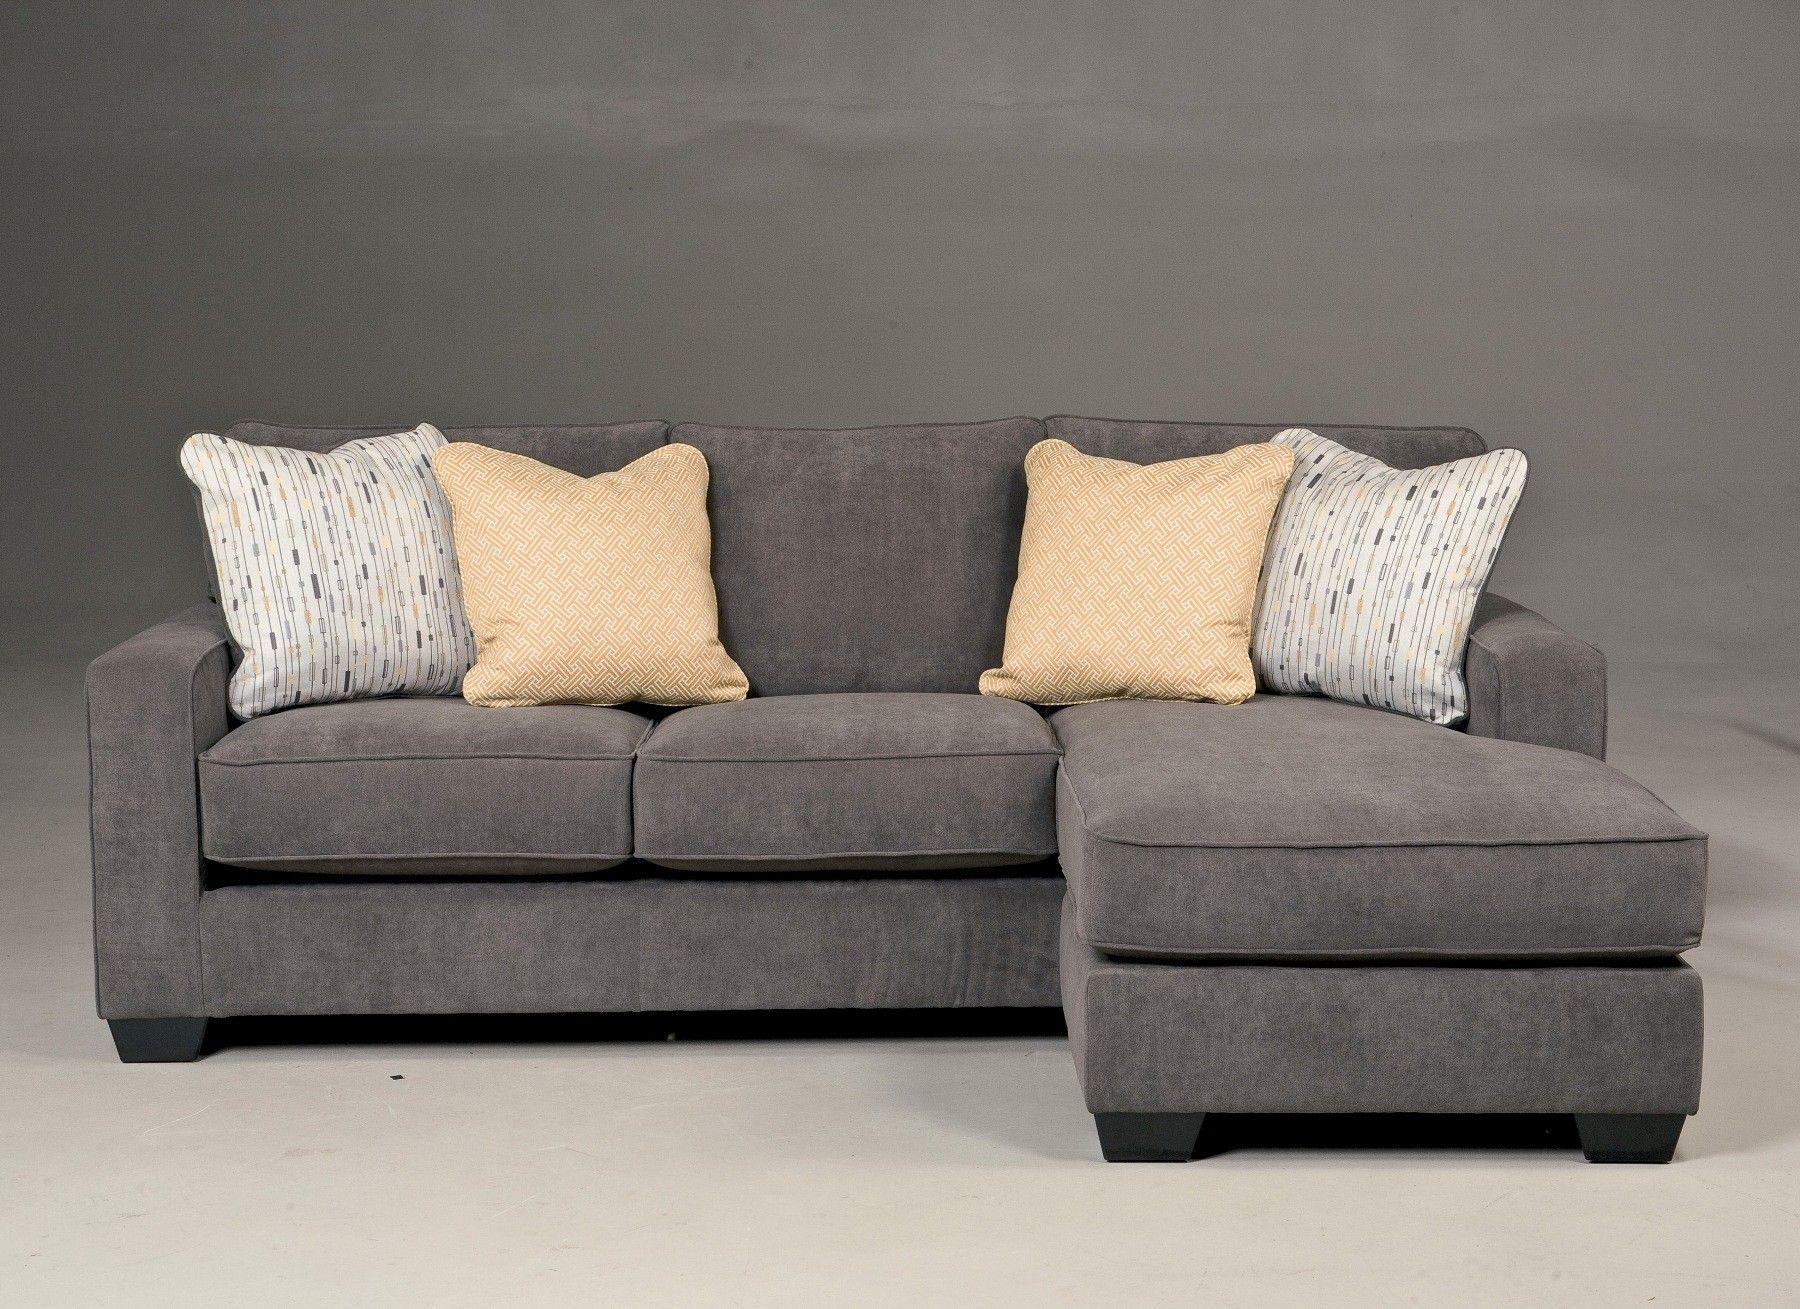 Prime 719 Ashley Hodan Marble Sofa With Chaise Good Fabric Spiritservingveterans Wood Chair Design Ideas Spiritservingveteransorg